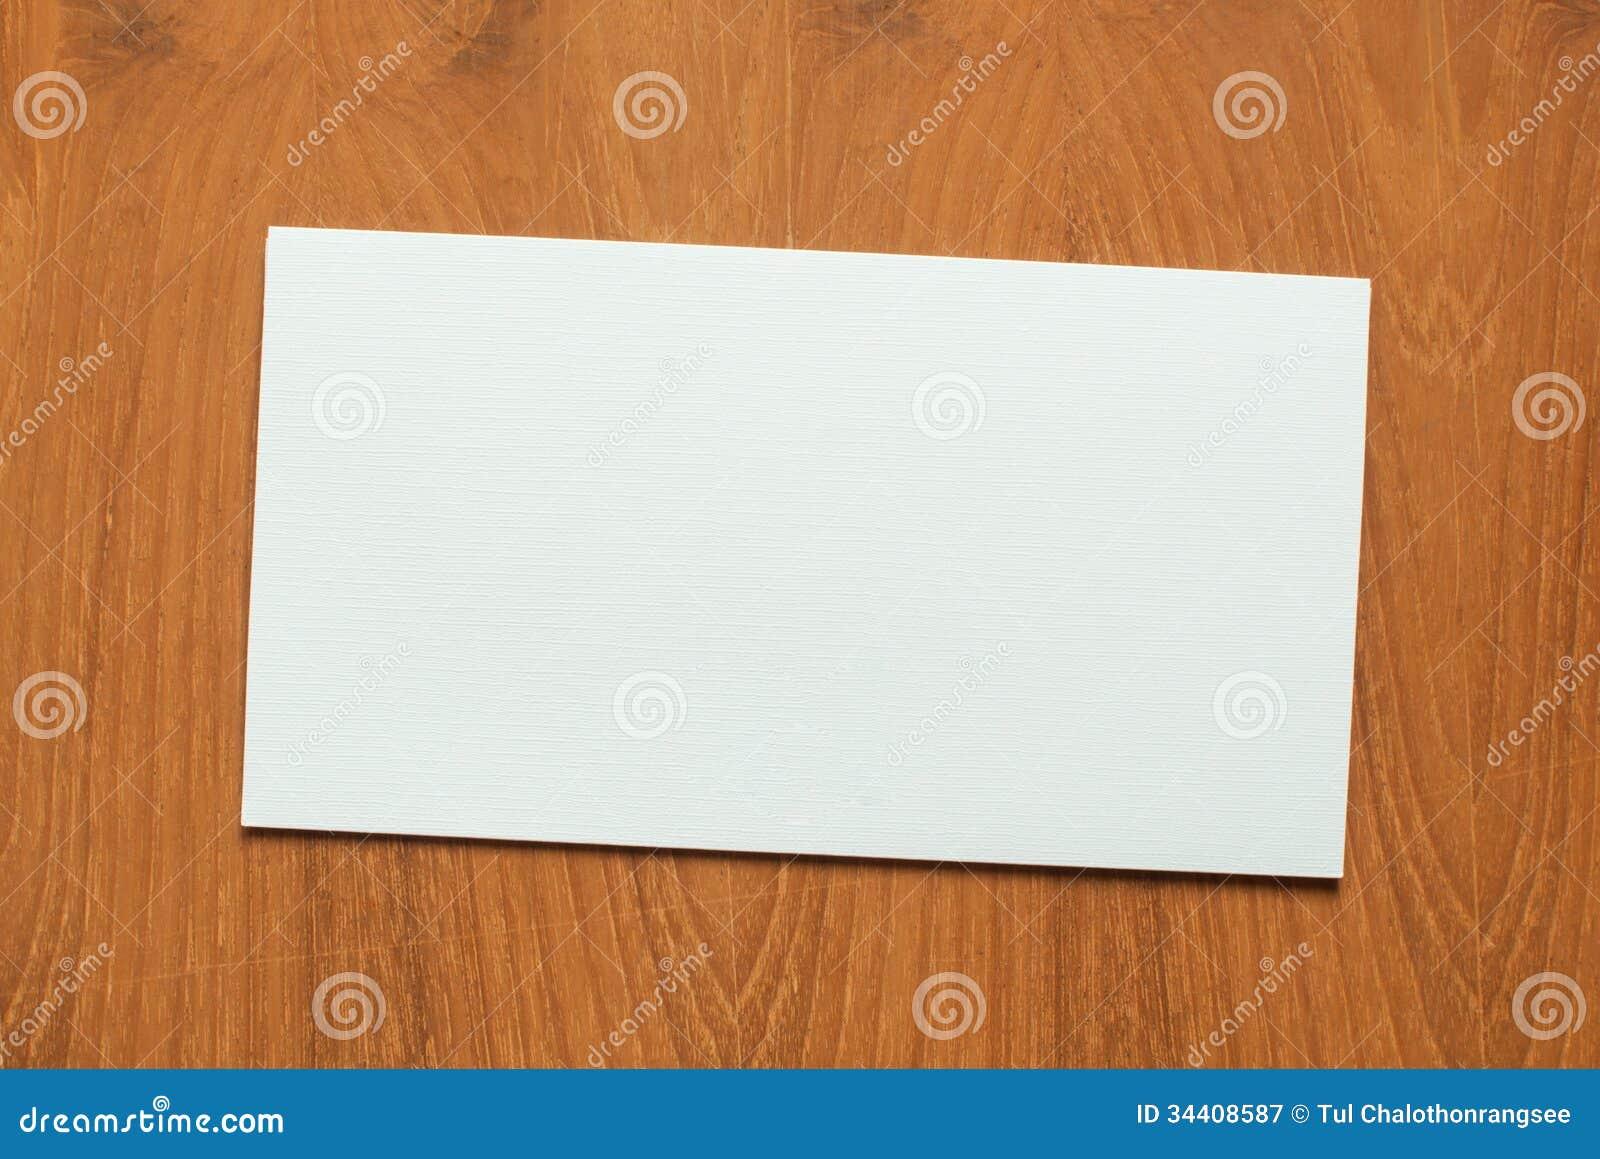 blank greeting card stock image  image of blank  memo